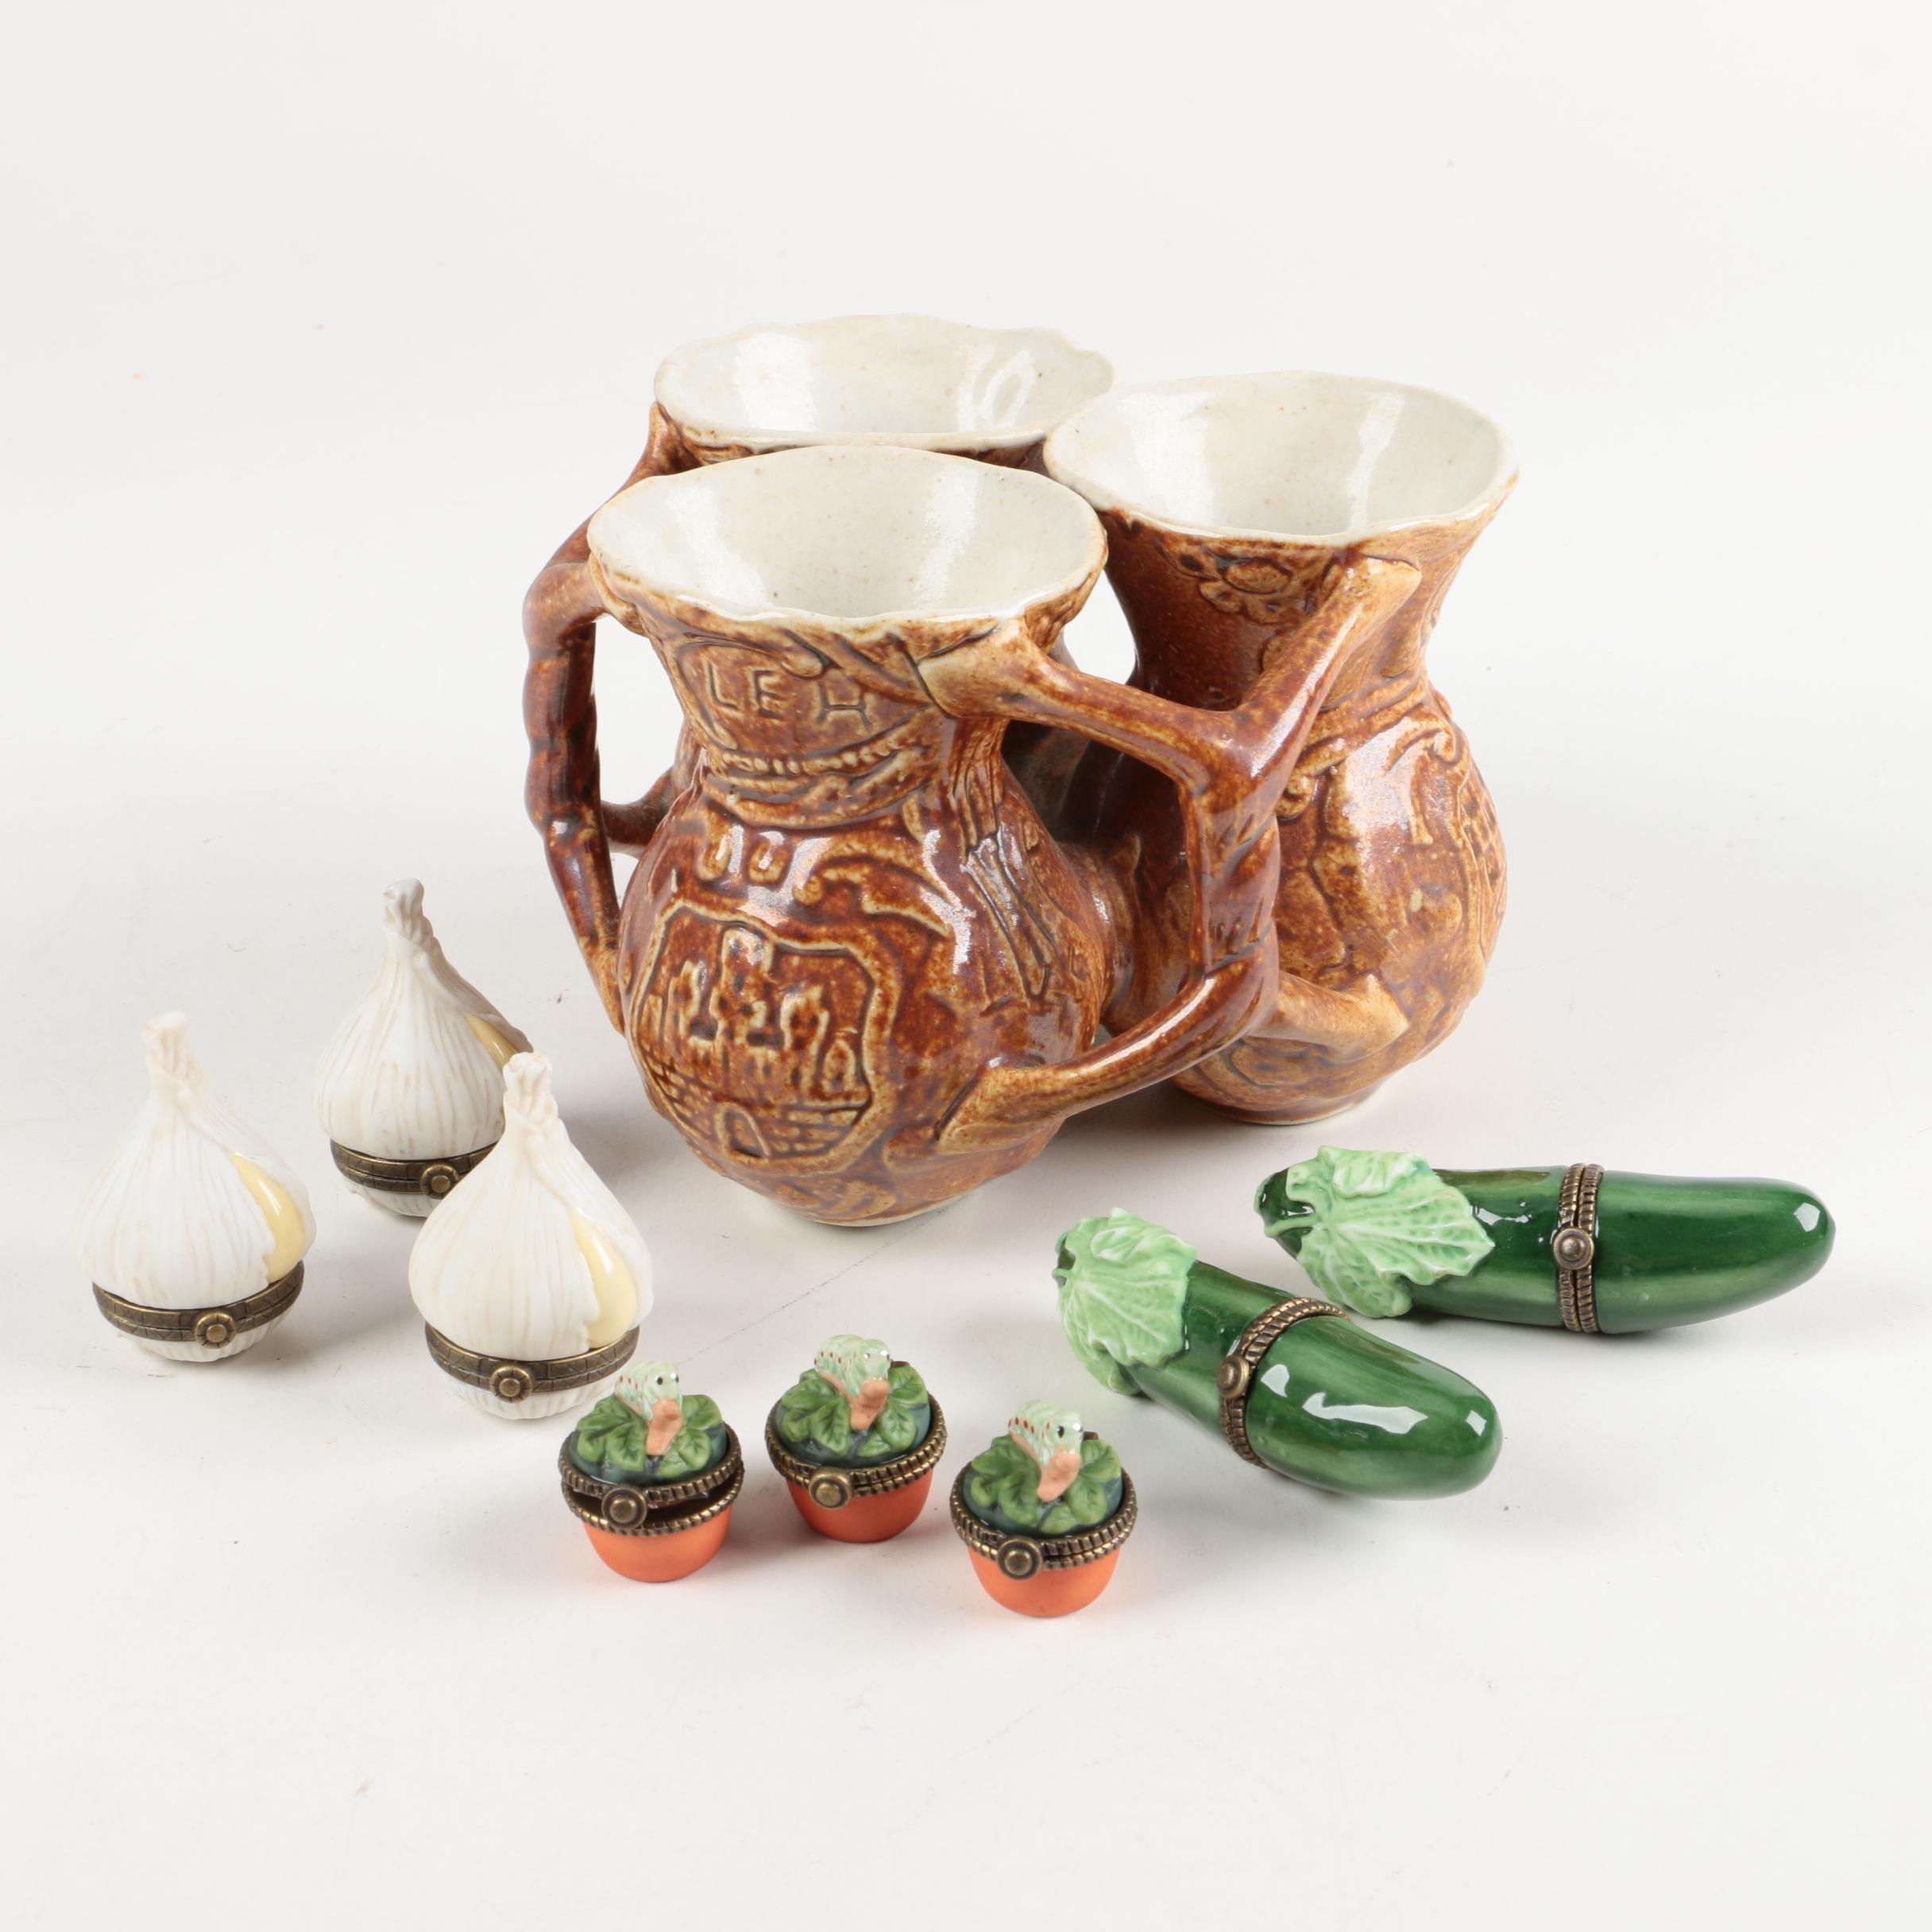 Vintage Ceramic Bilikum and Trinket Boxes